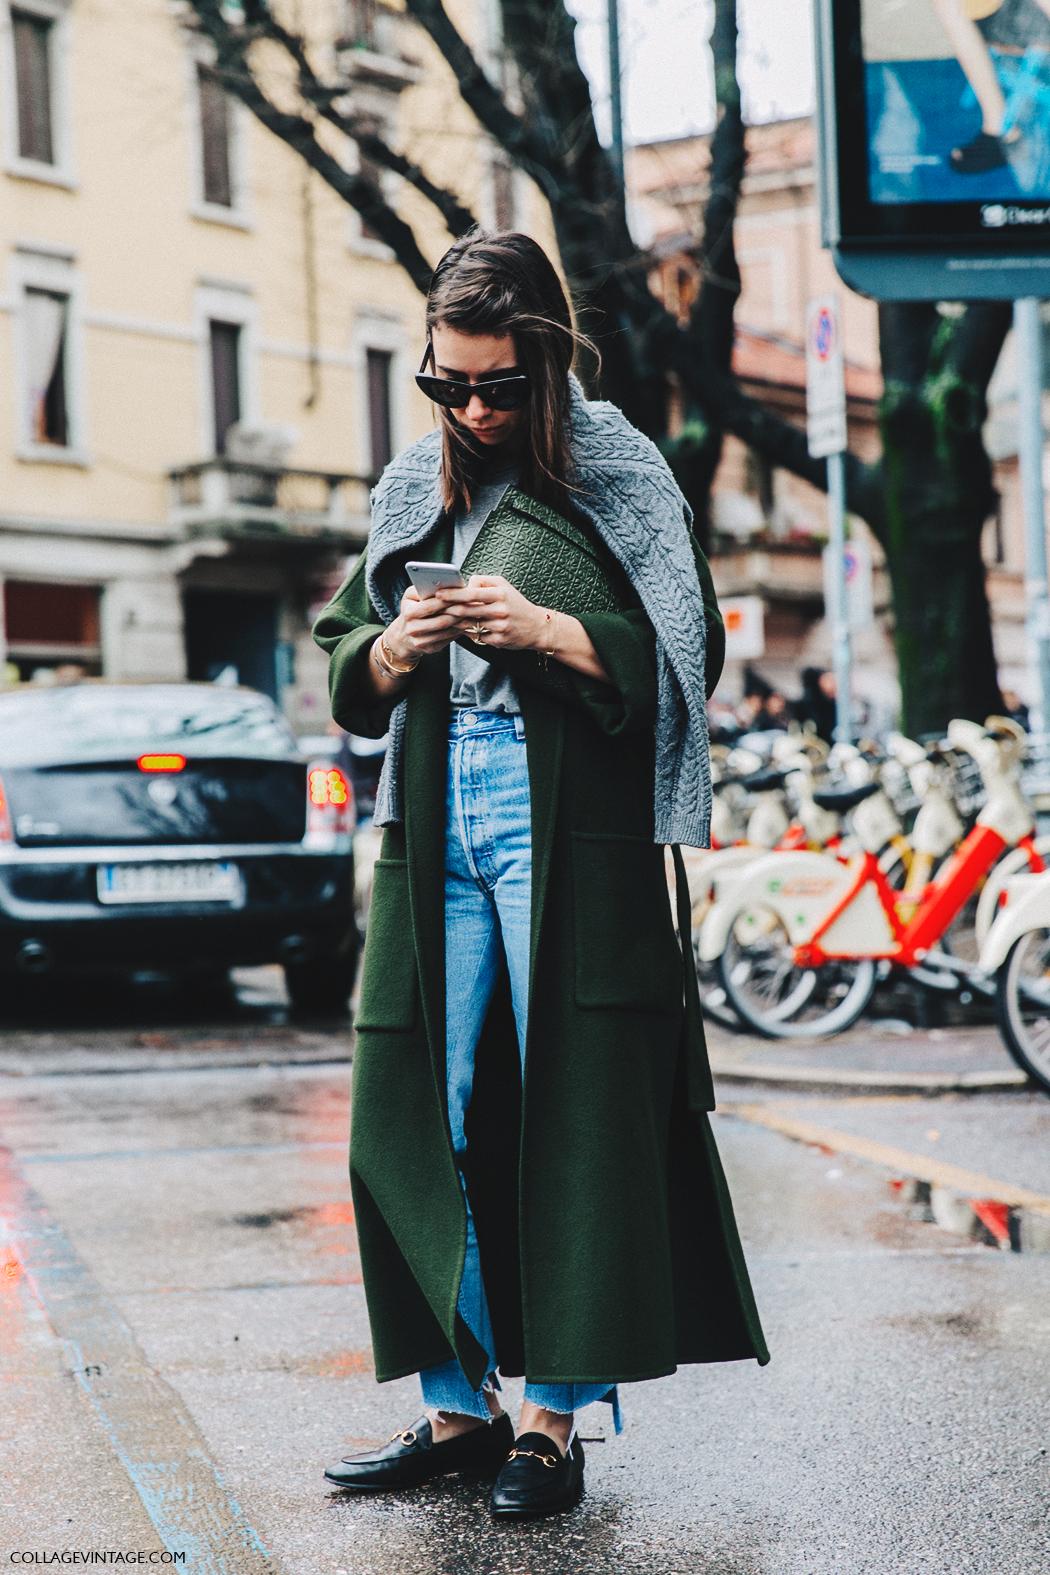 Milan_Fashion_Week_Fall_16-MFW-Street_Style-Collage_Vintage-Natasha_Goldenberg-Maxi_Coat-GUcci_Loafers-6